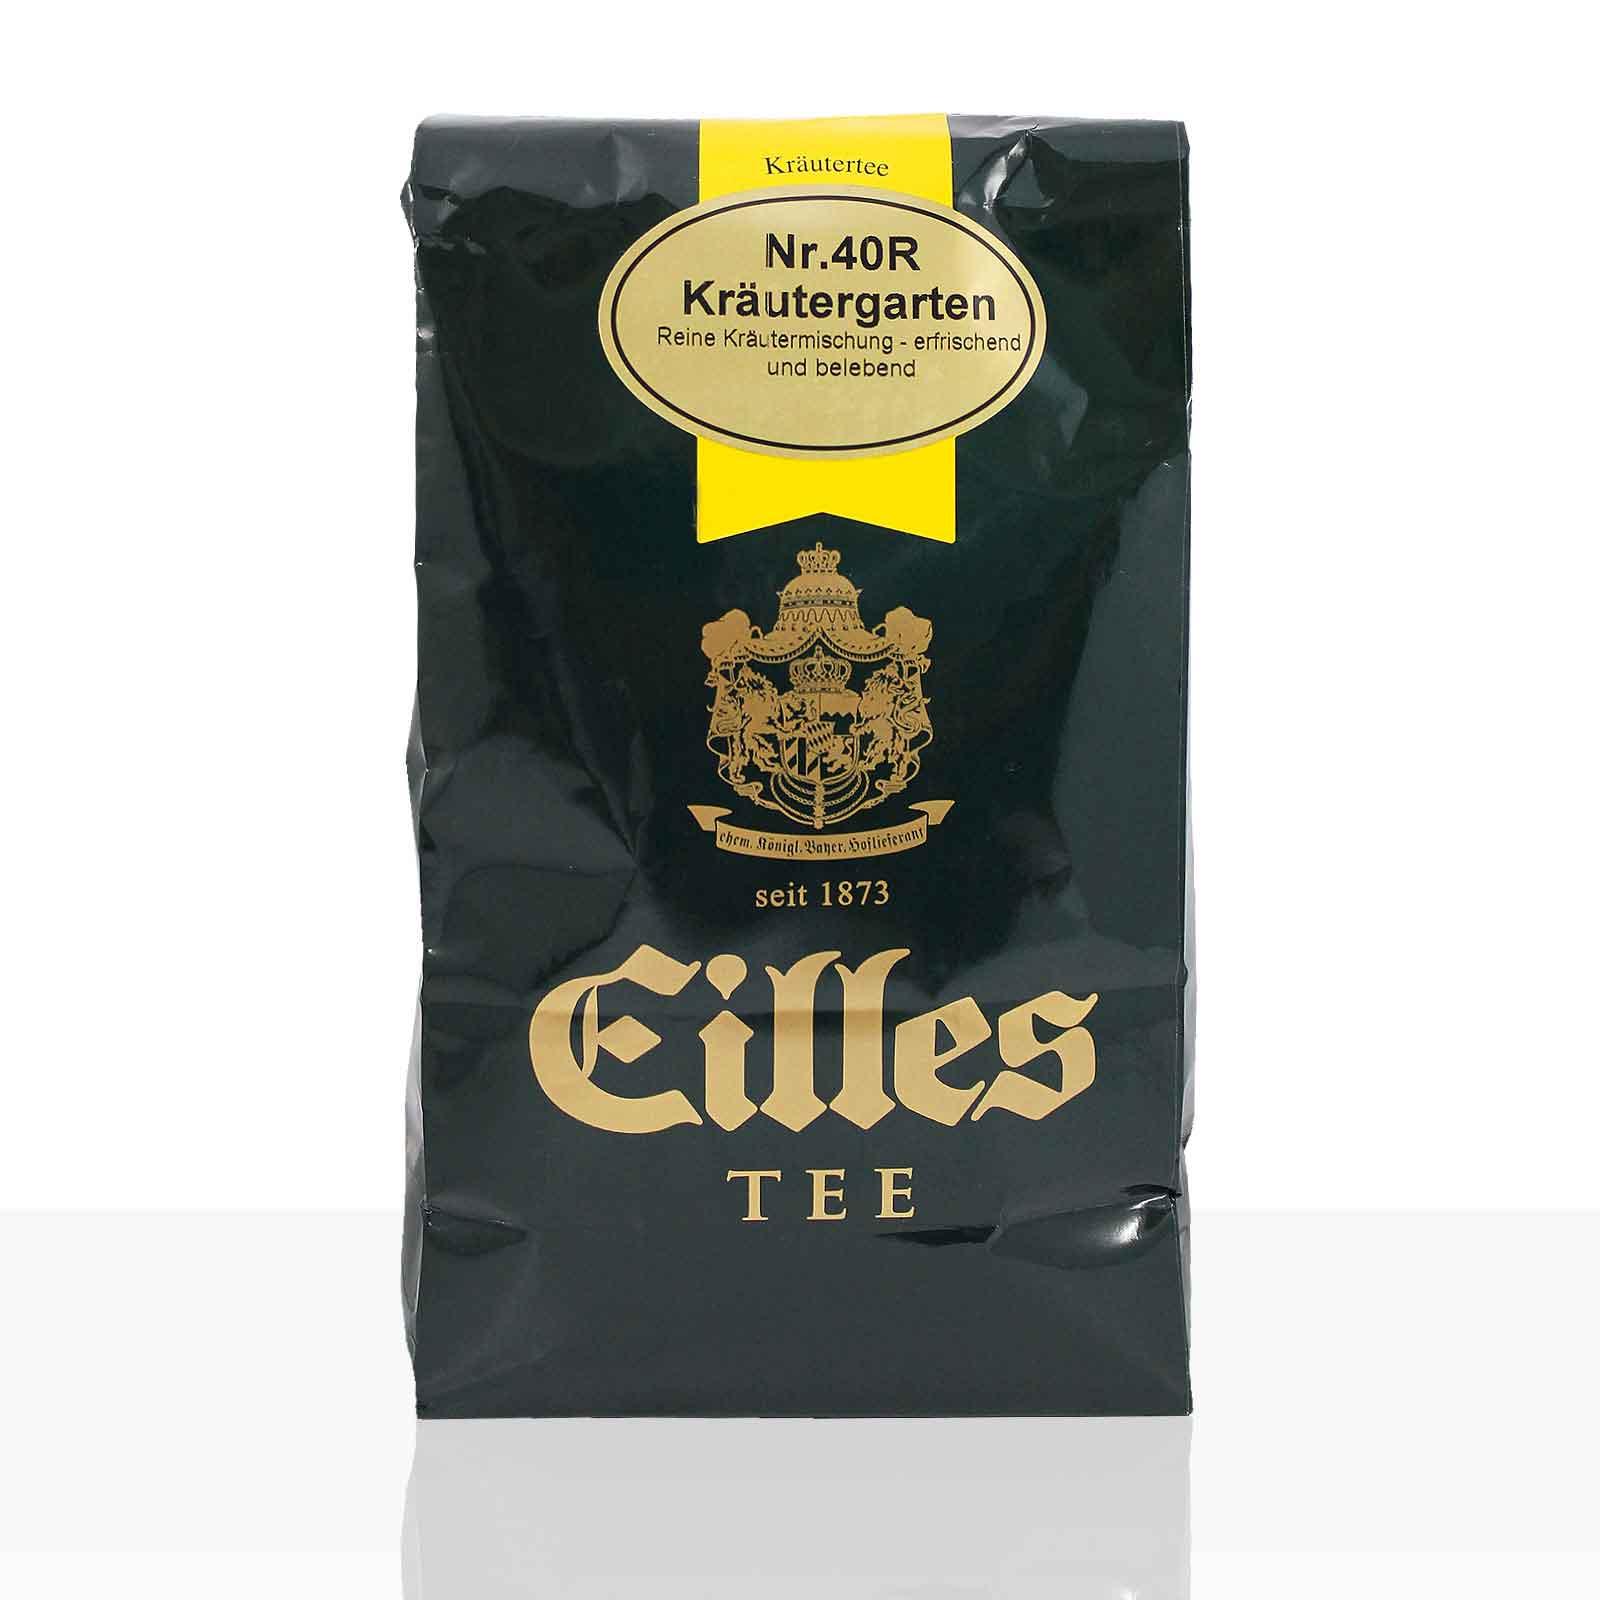 EILLES Tee Kräutergarten Nr. 40R, 250g loser Tee